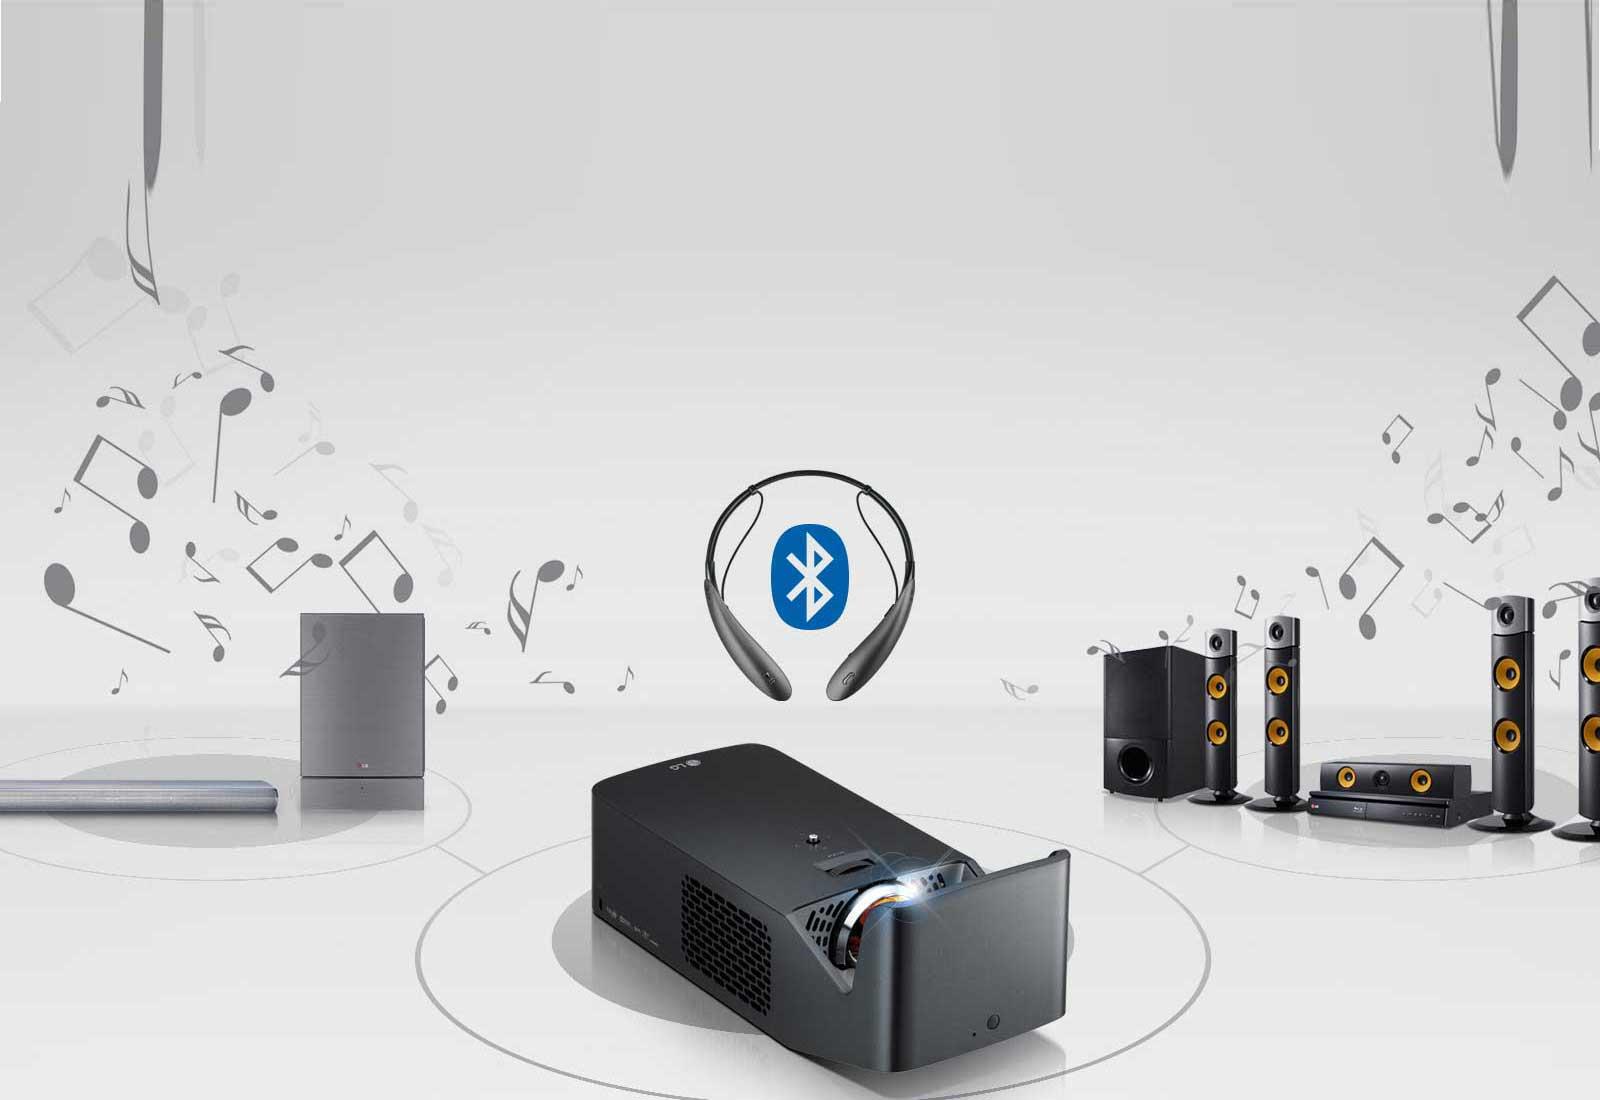 08_PF1000U-desktopdesktopmn-desktop